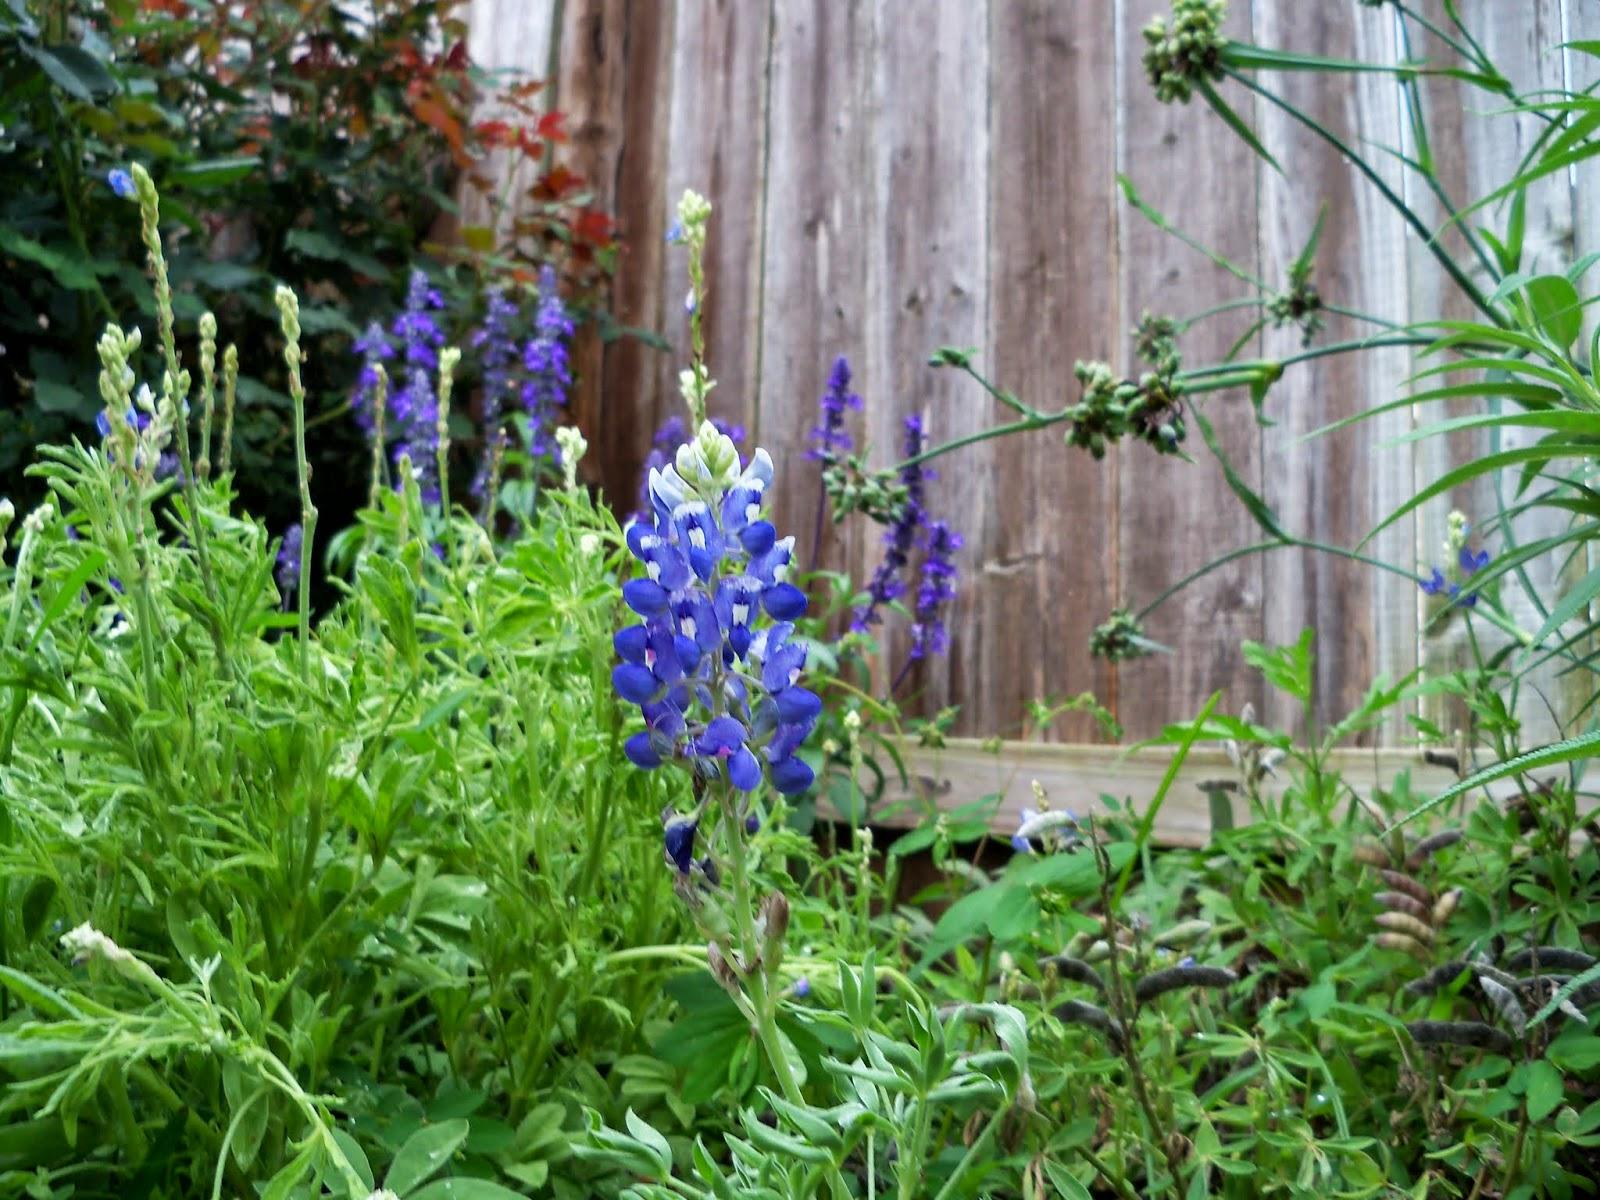 Gardening 2014 - 116_2587.JPG